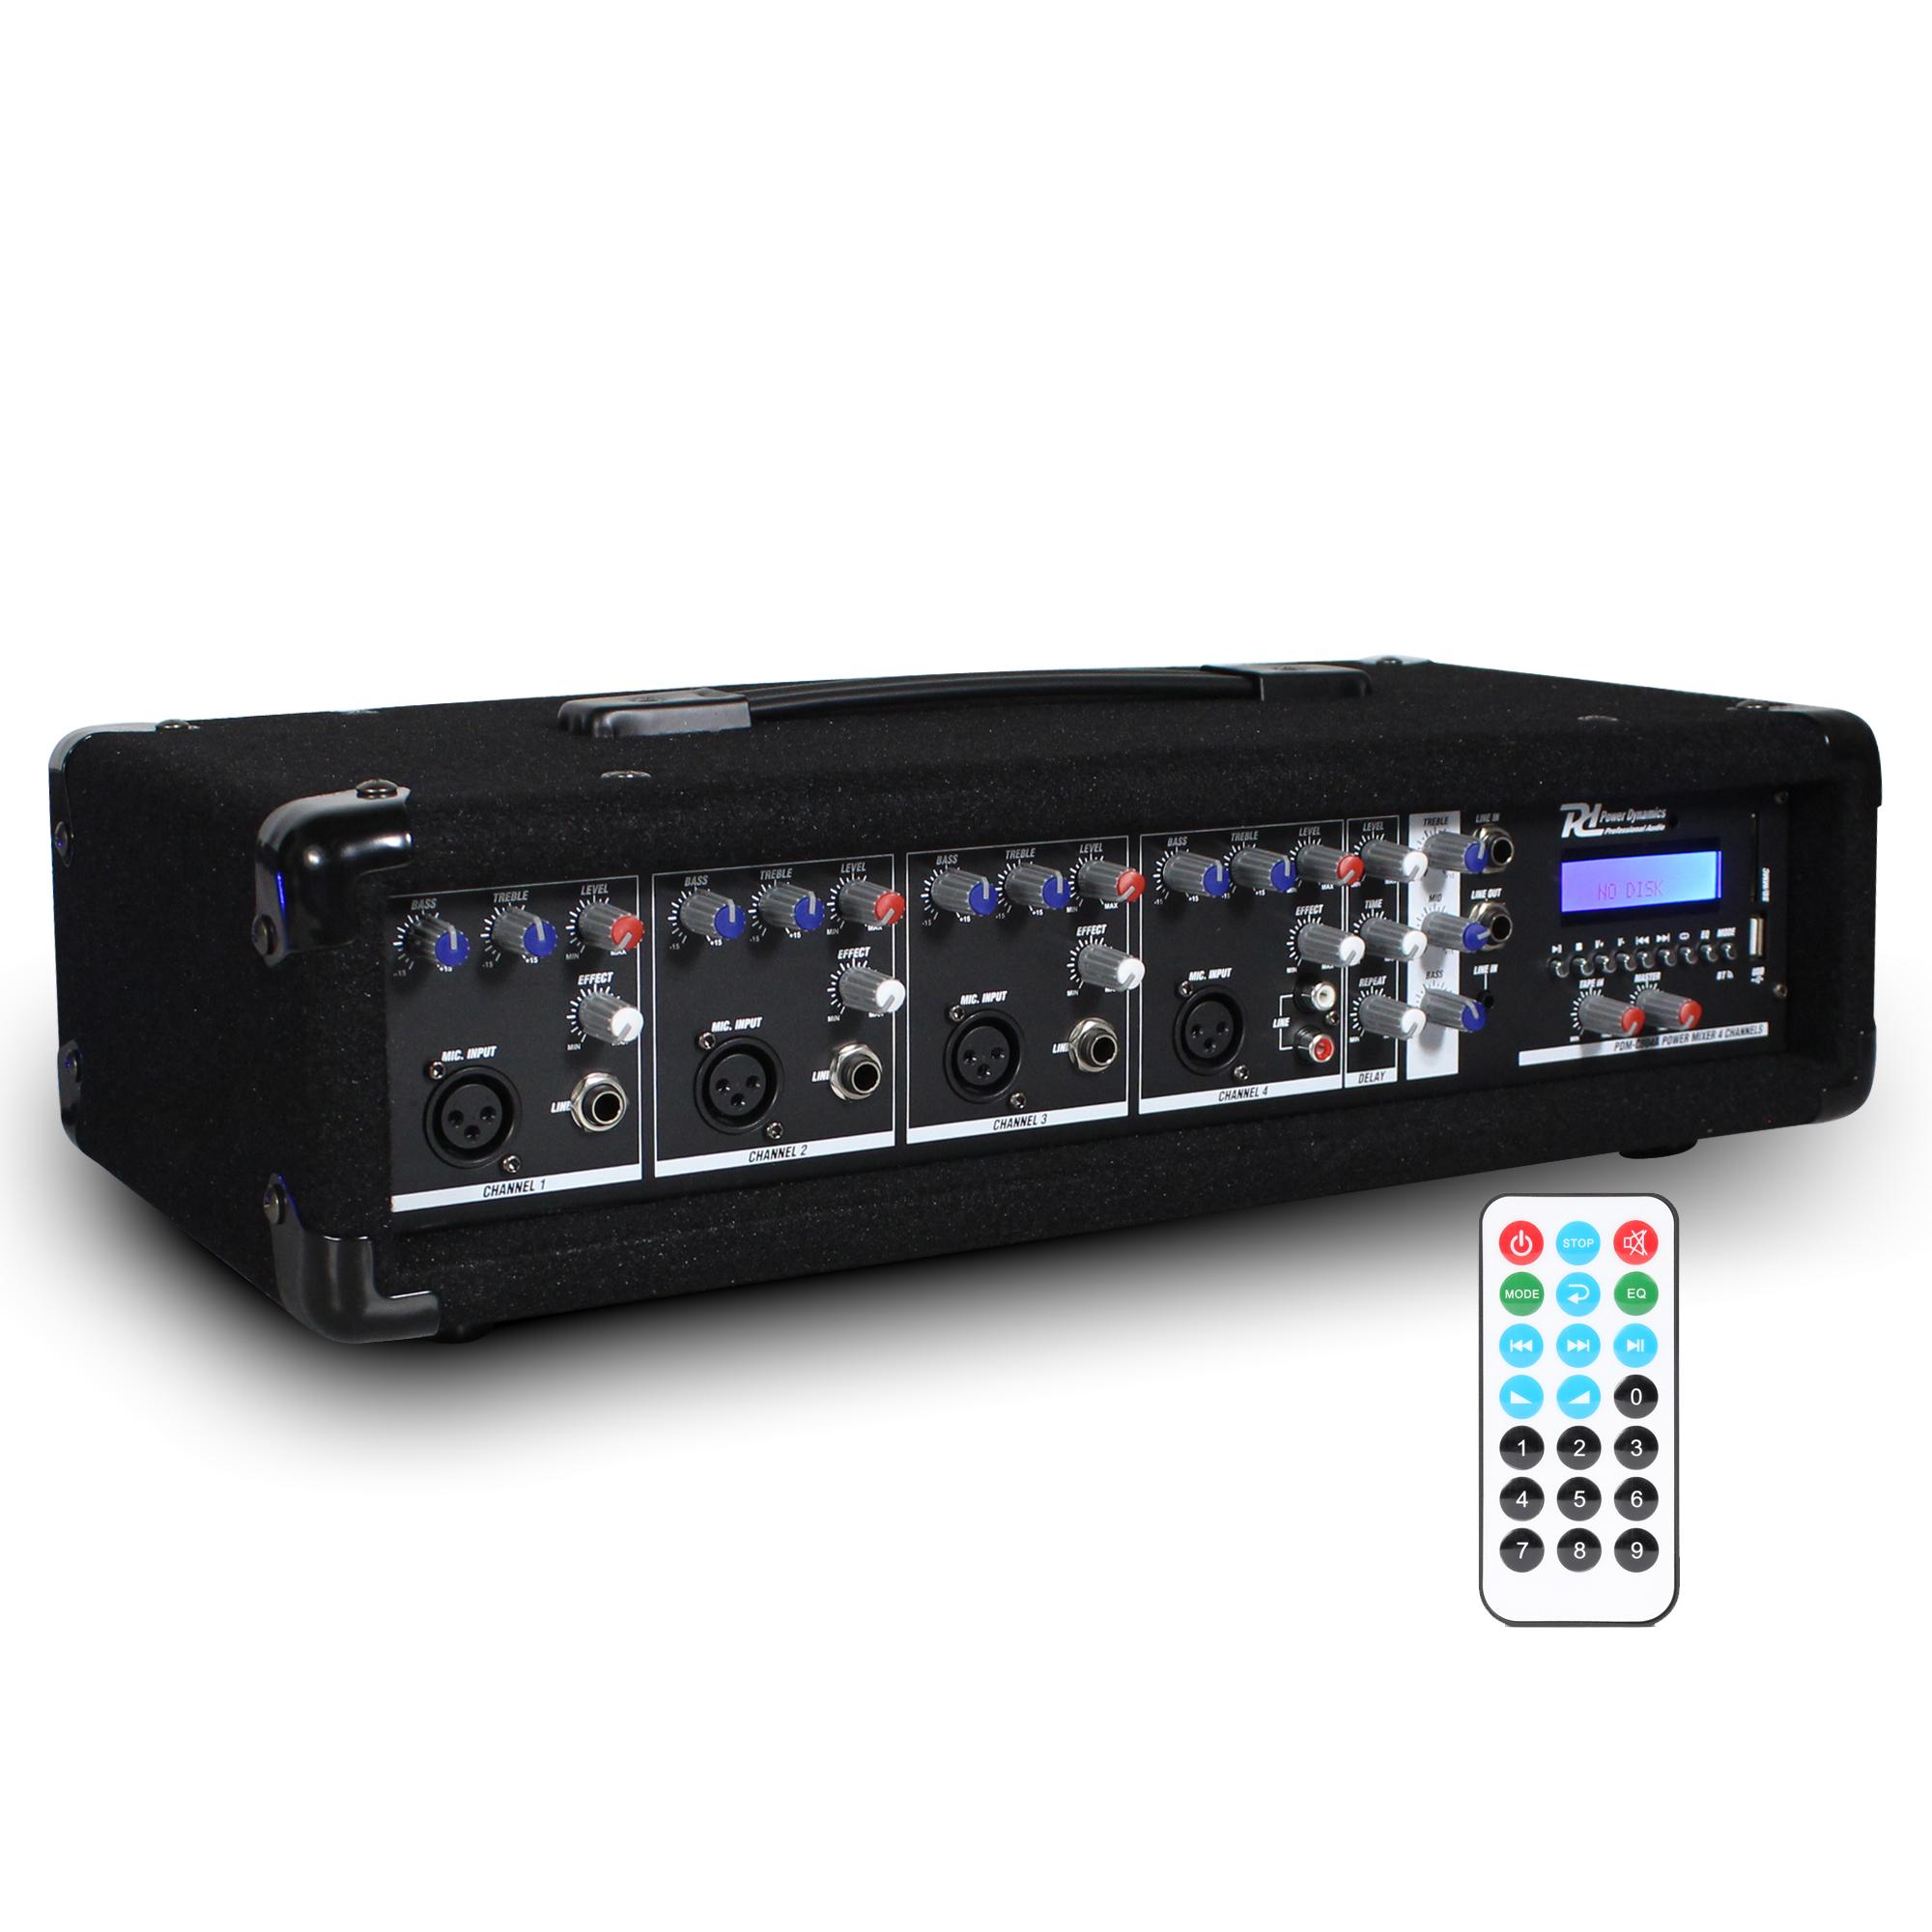 PD PDM-C405A Bluetooth 4 Channel Mixer Amplifier